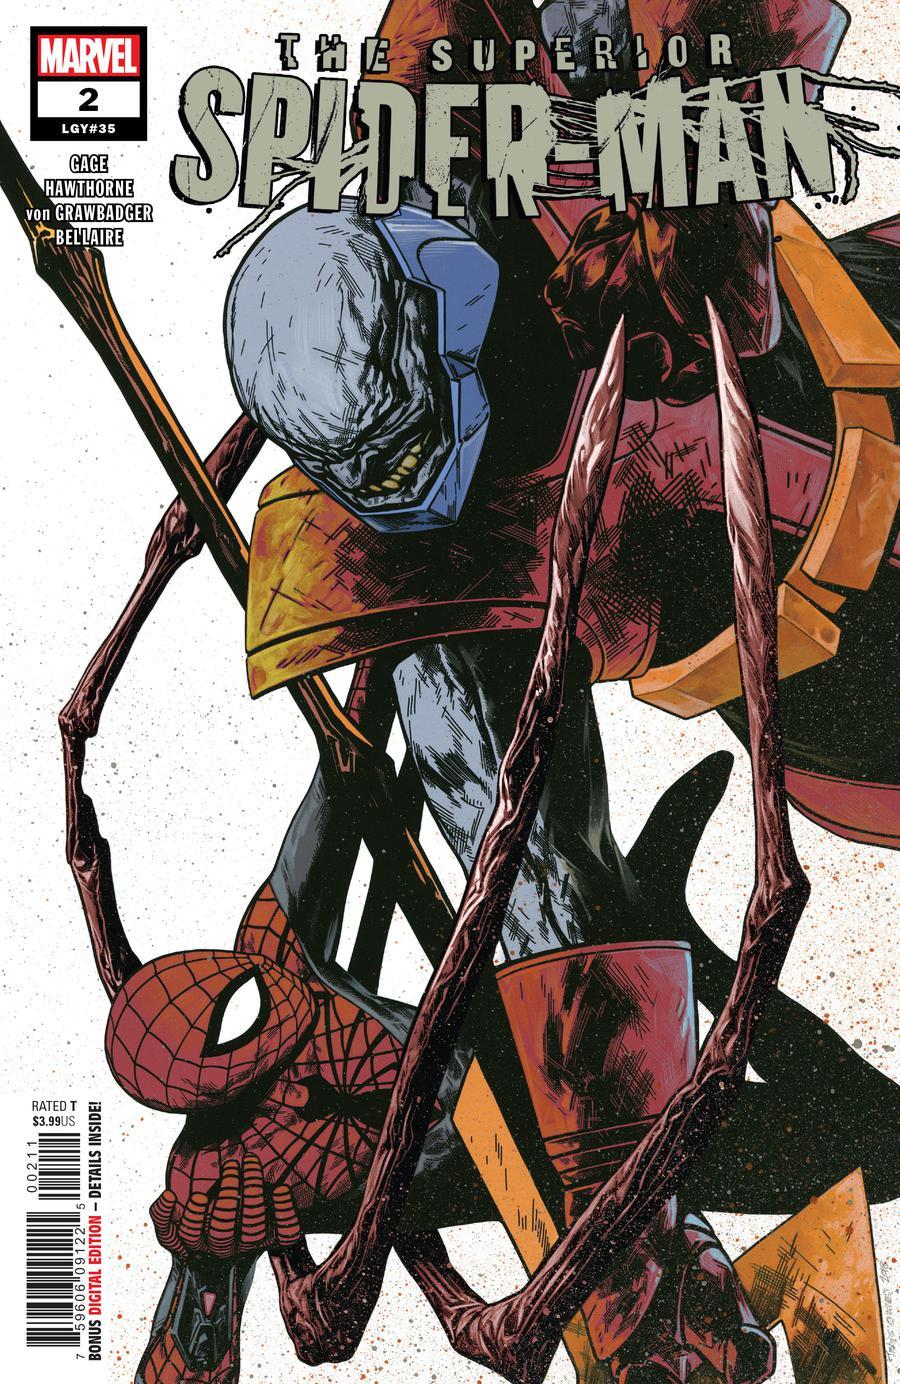 Superior Spider-Man Vol 2 #2 Cover A Regular Travis Charest Cover